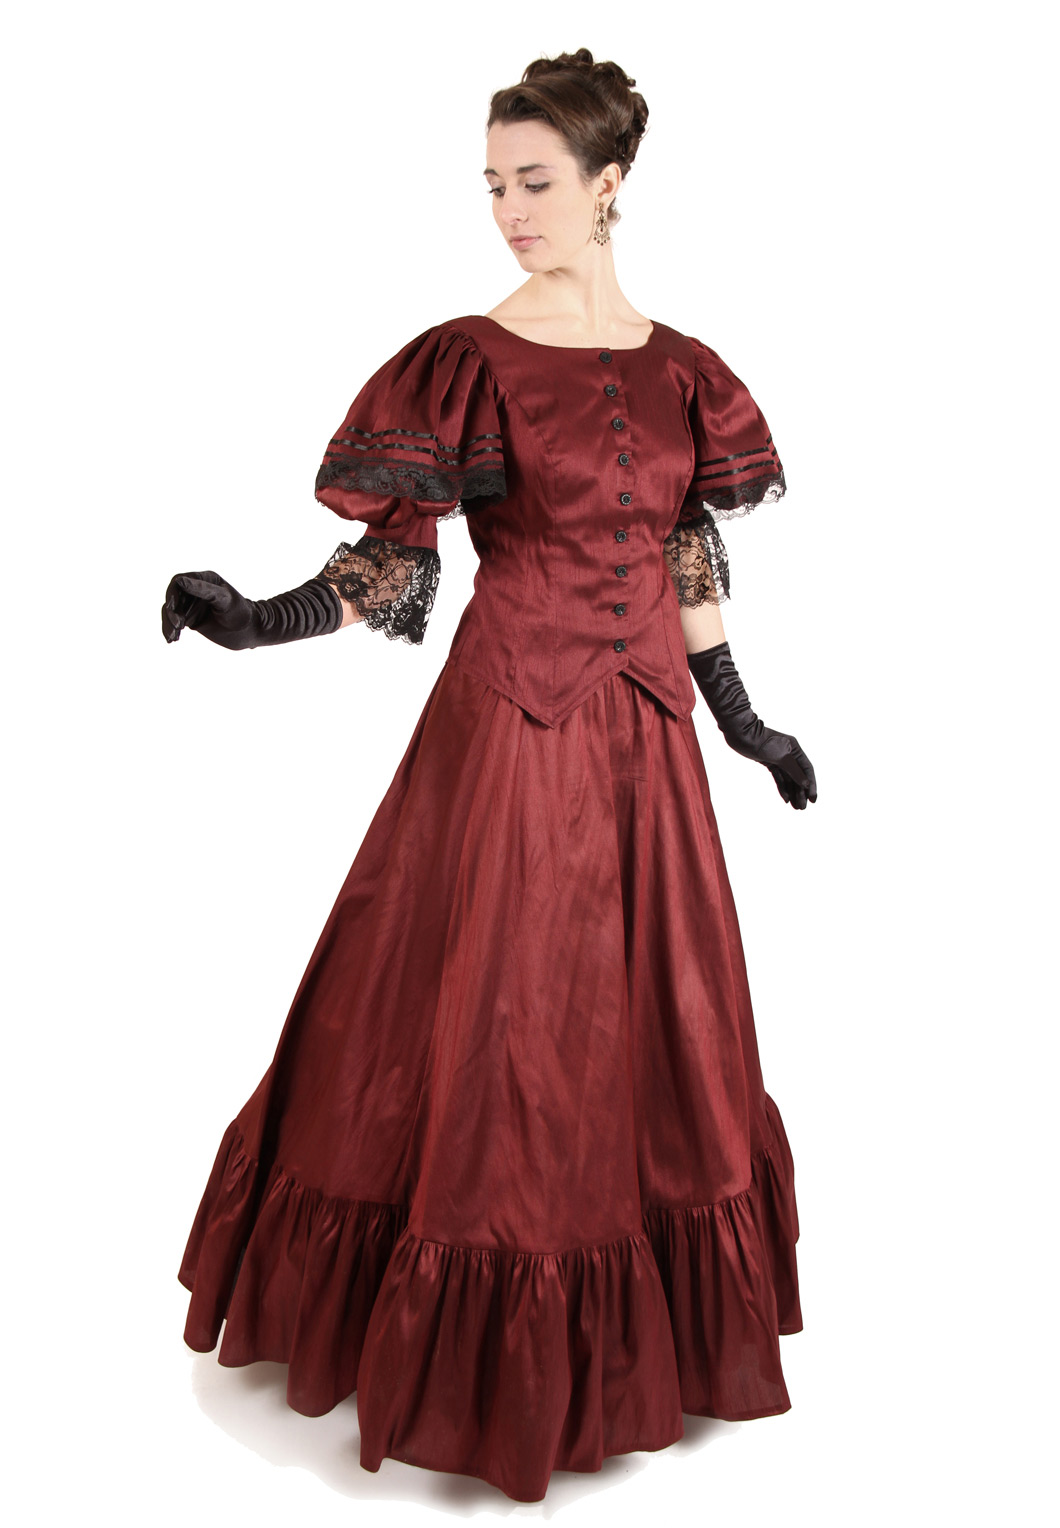 Lara Victorian Dress | Recollections